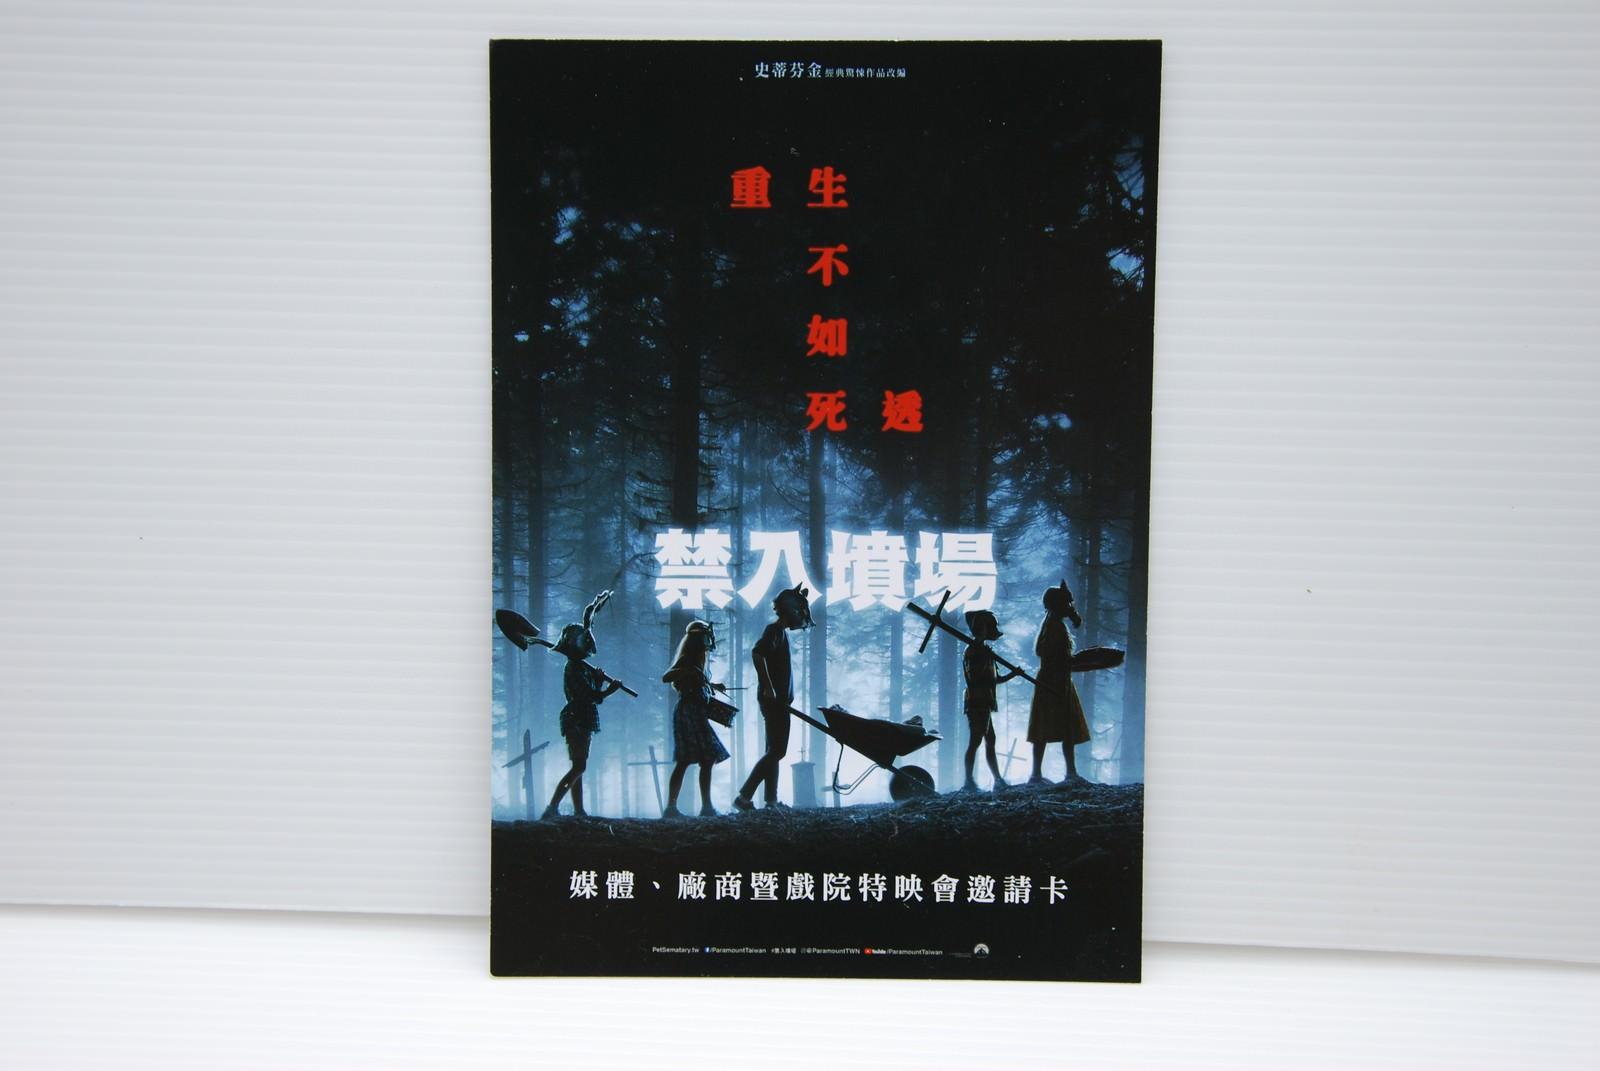 Movie, Pet Sematary(美國, 2019年) / 禁入墳場(台灣) / 詭墓(香港) / 宠物坟场(網路), 特映會邀請卡